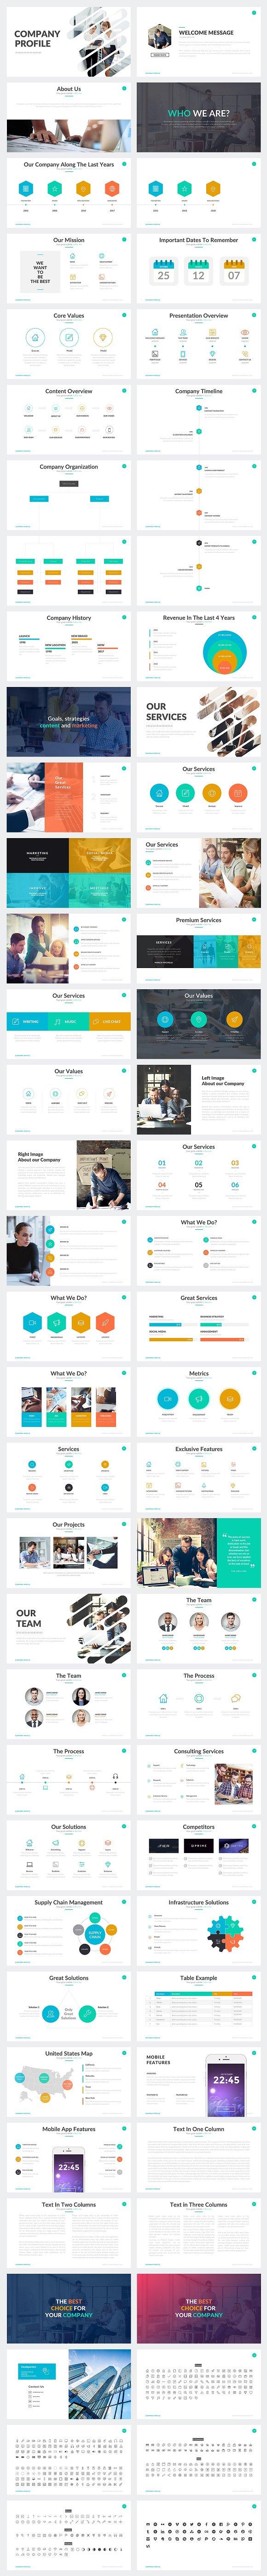 company profile keynote template presentation templates creative market